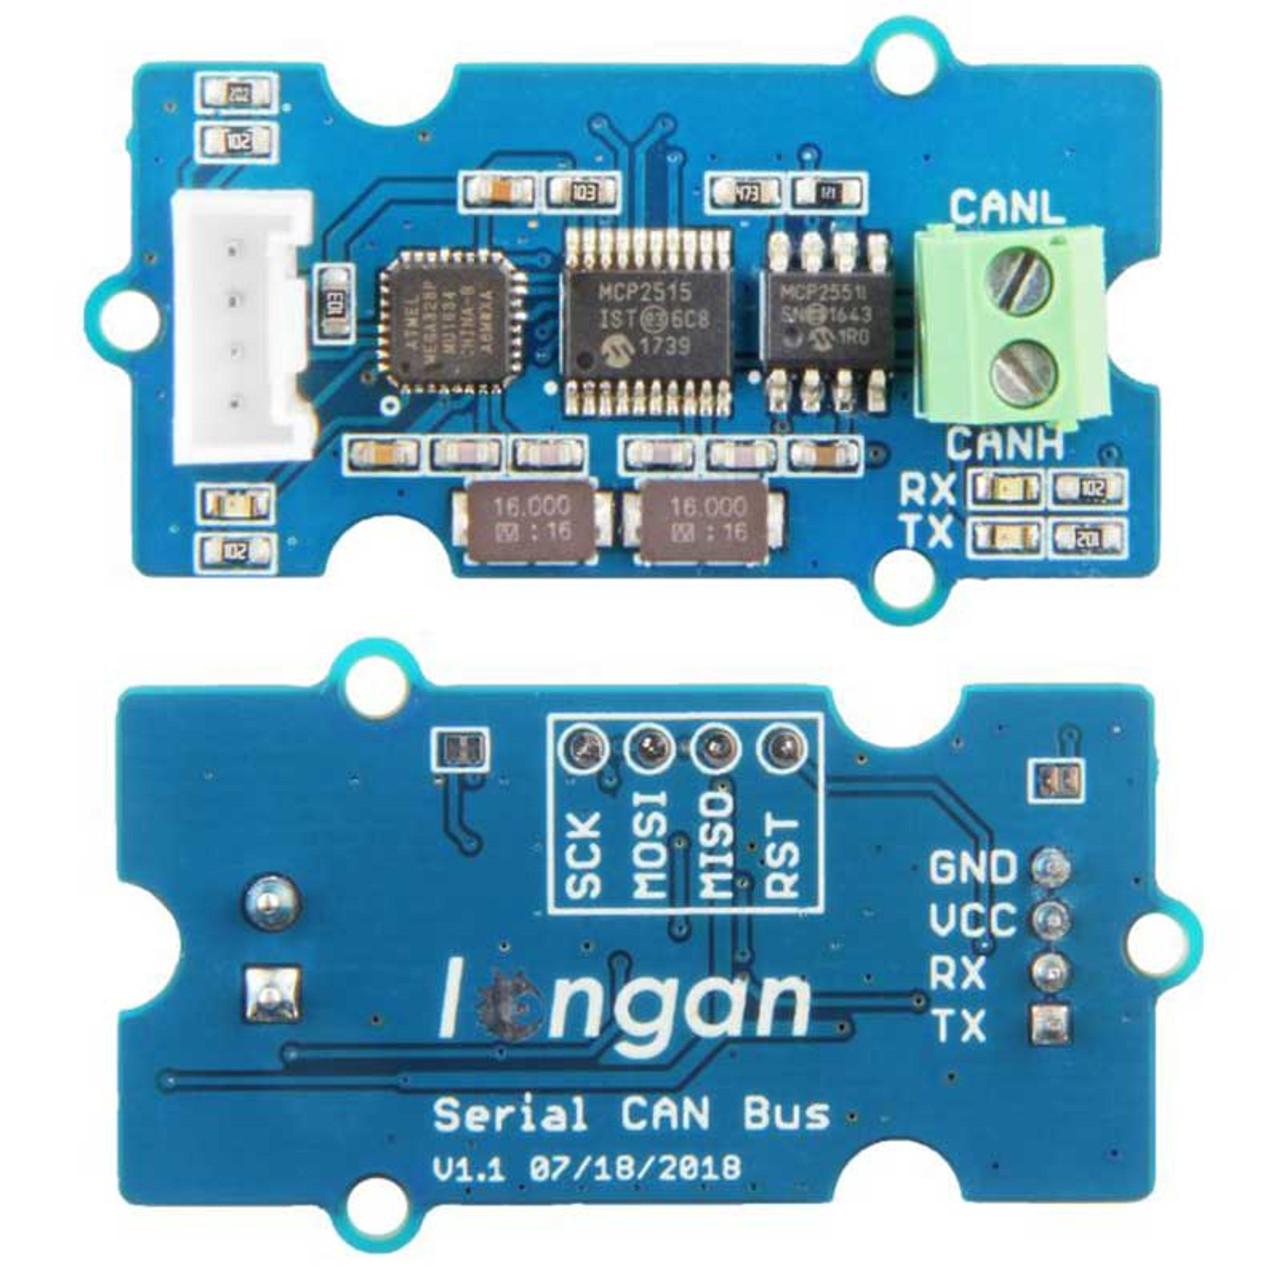 Serial CAN-BUS Module based on MCP2551 and MCP2515 - Seeedstudio